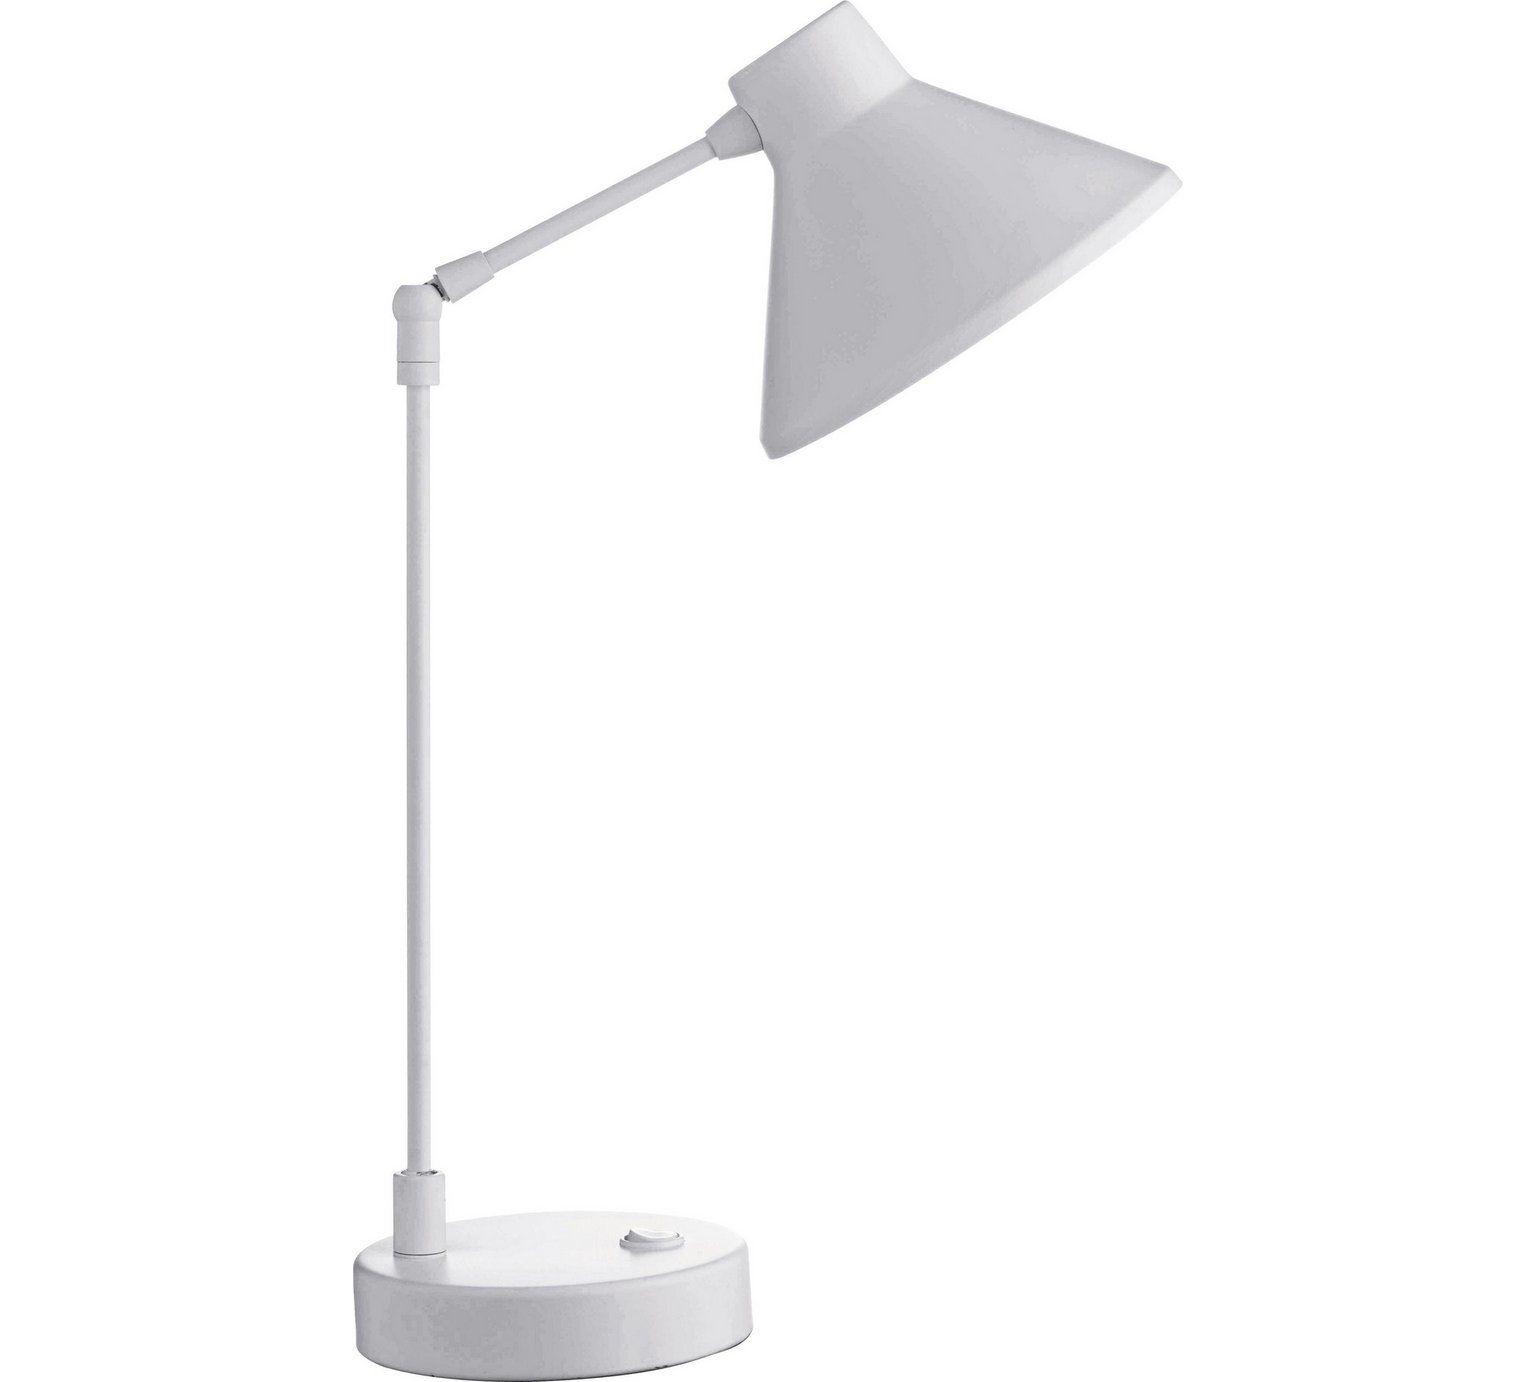 Buy habitat bobby desk lamp white at argos visit argos